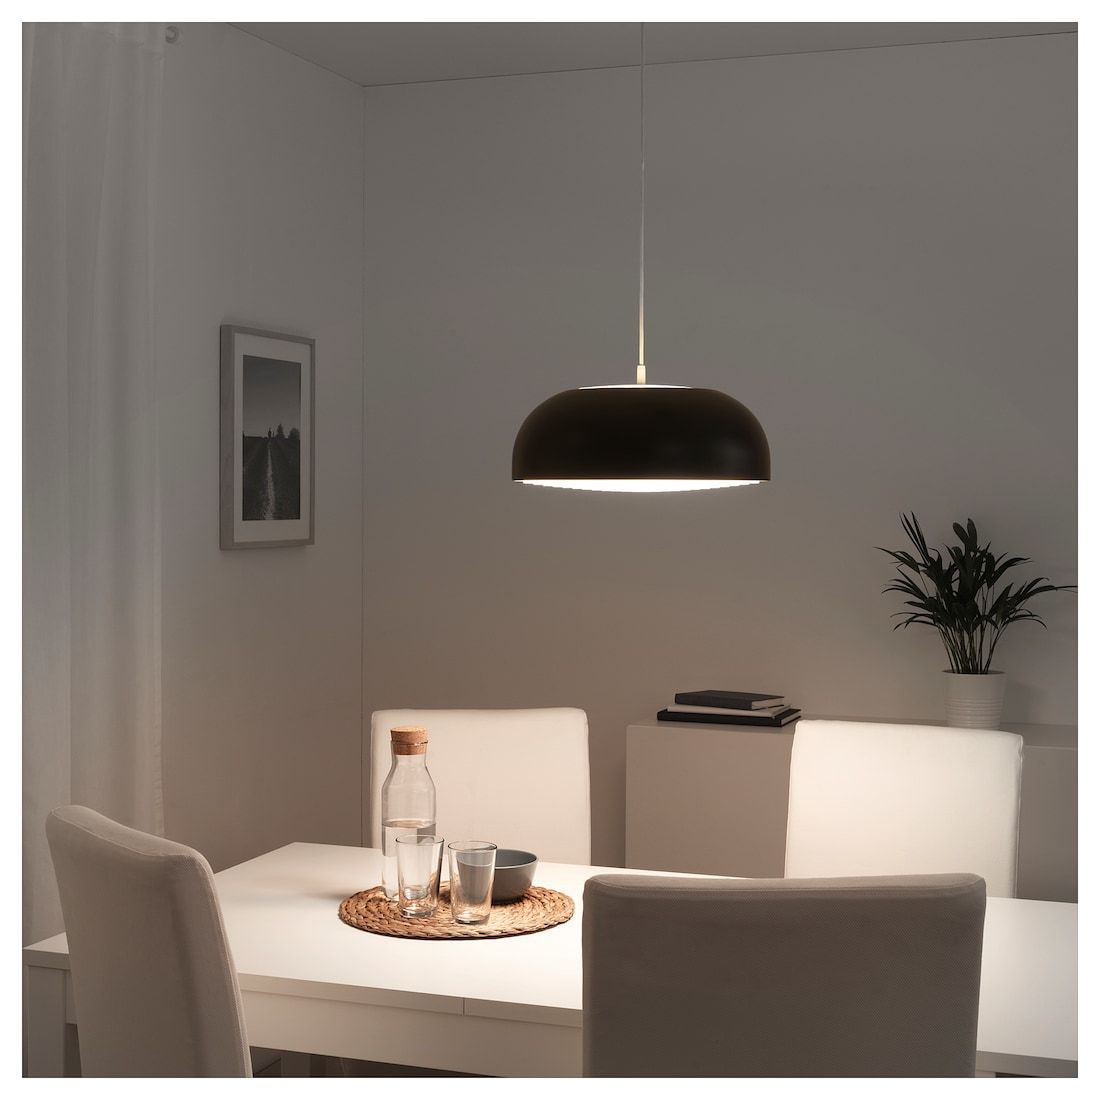 Nymane Hangeleuchte Anthrazit Ikea Deutschland Pendant Lamp Ikea Lamp